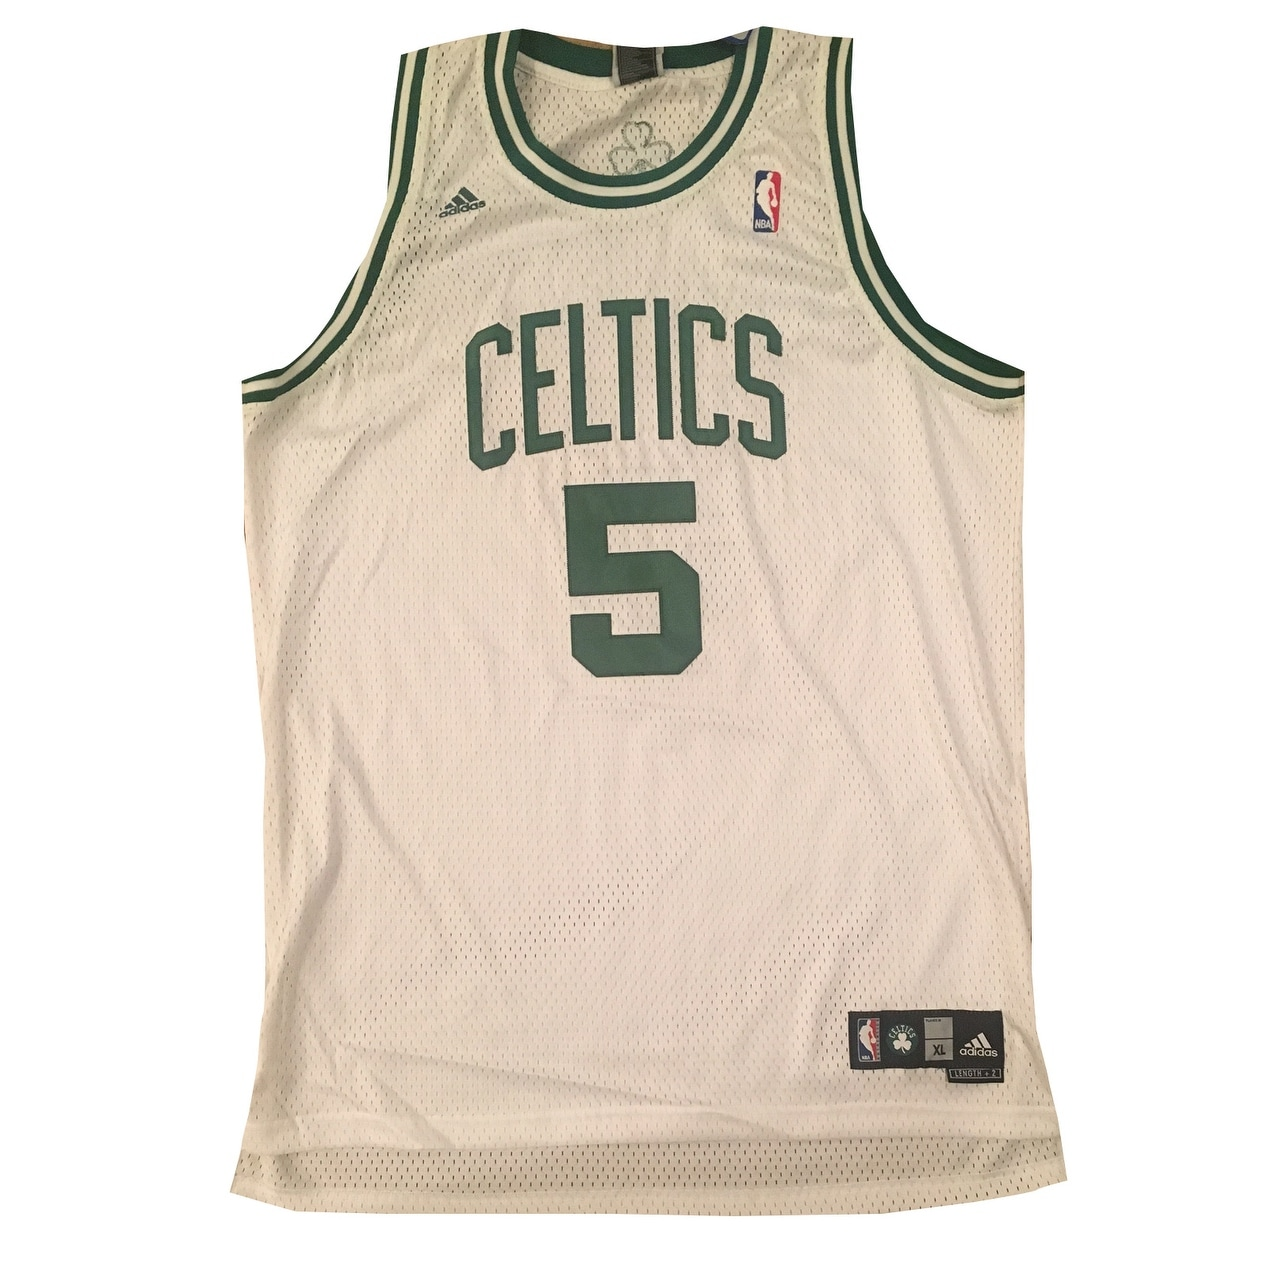 pretty nice 6198a 6715a Kevin Garnett Autographed Boston Celtics Swingman Signed Basketball Jersey  2008 CHAMPS PSA DNA COA